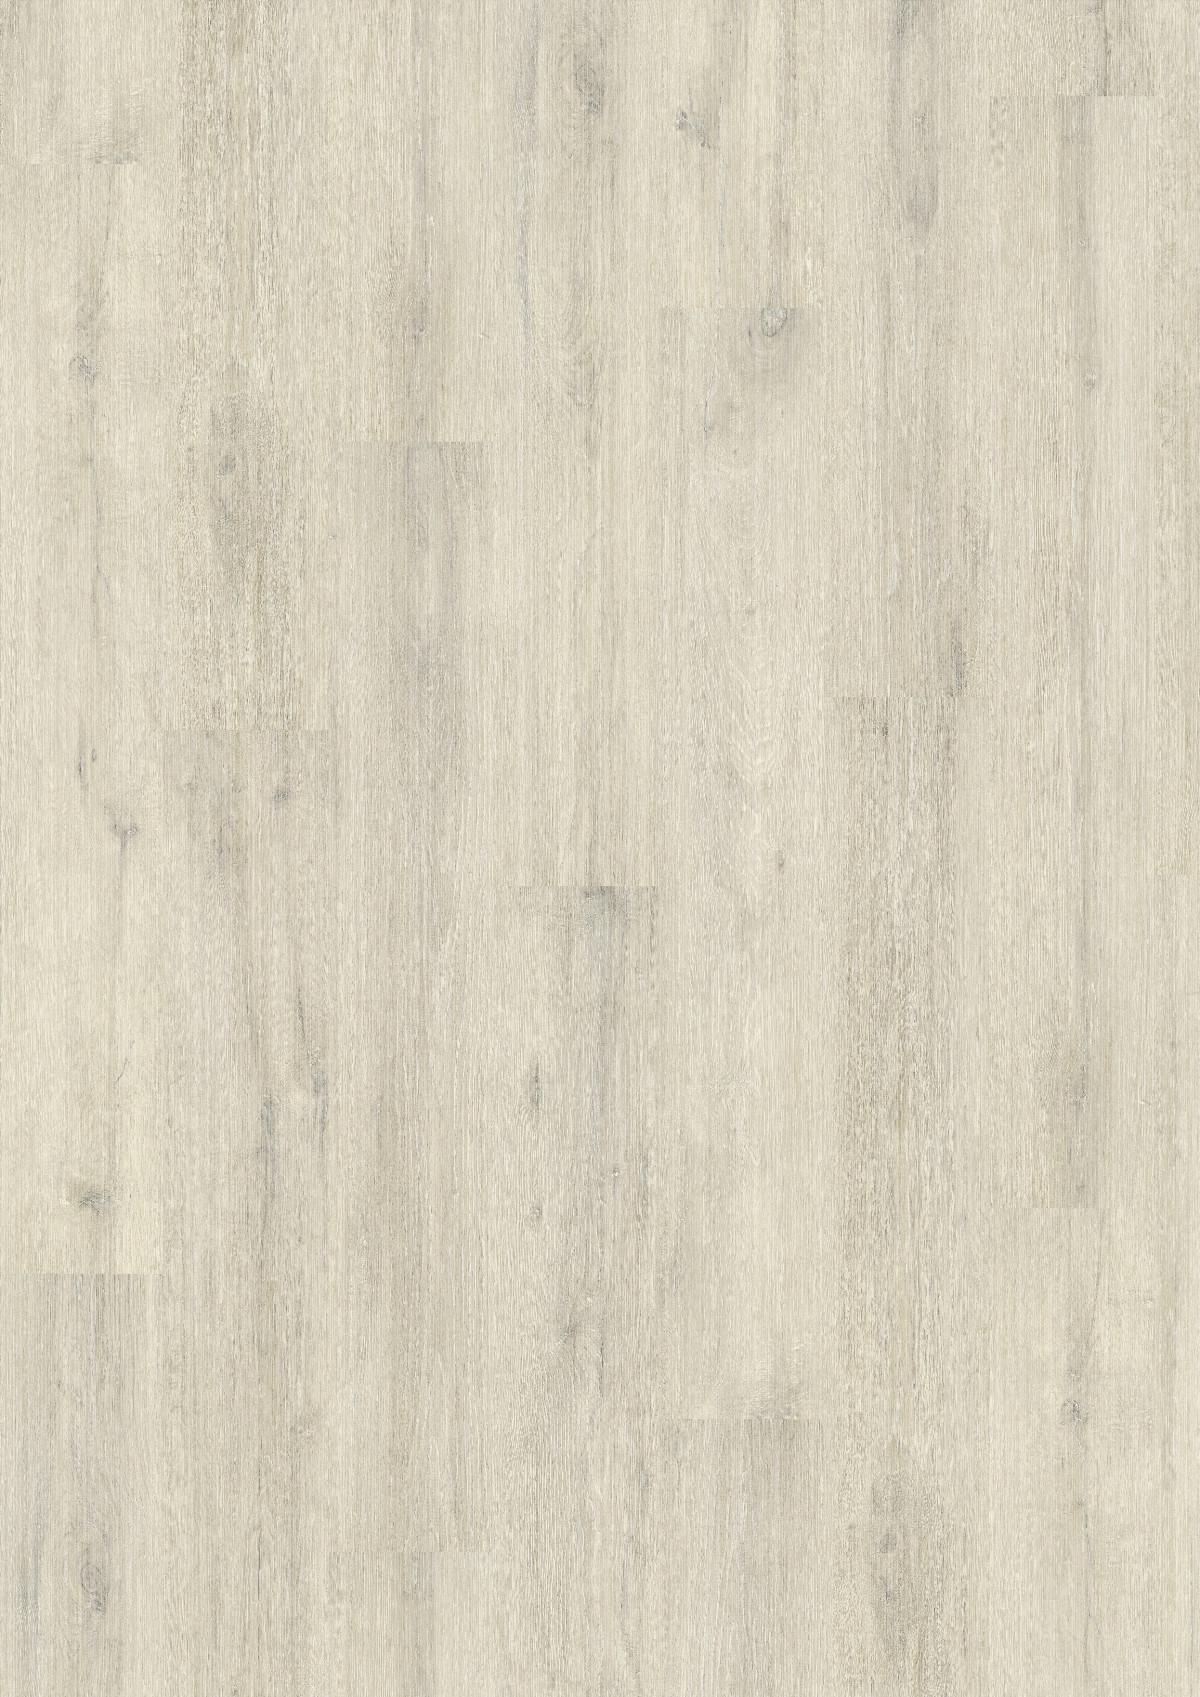 Laminat hell textur  JOKA-Laminat Sortiment